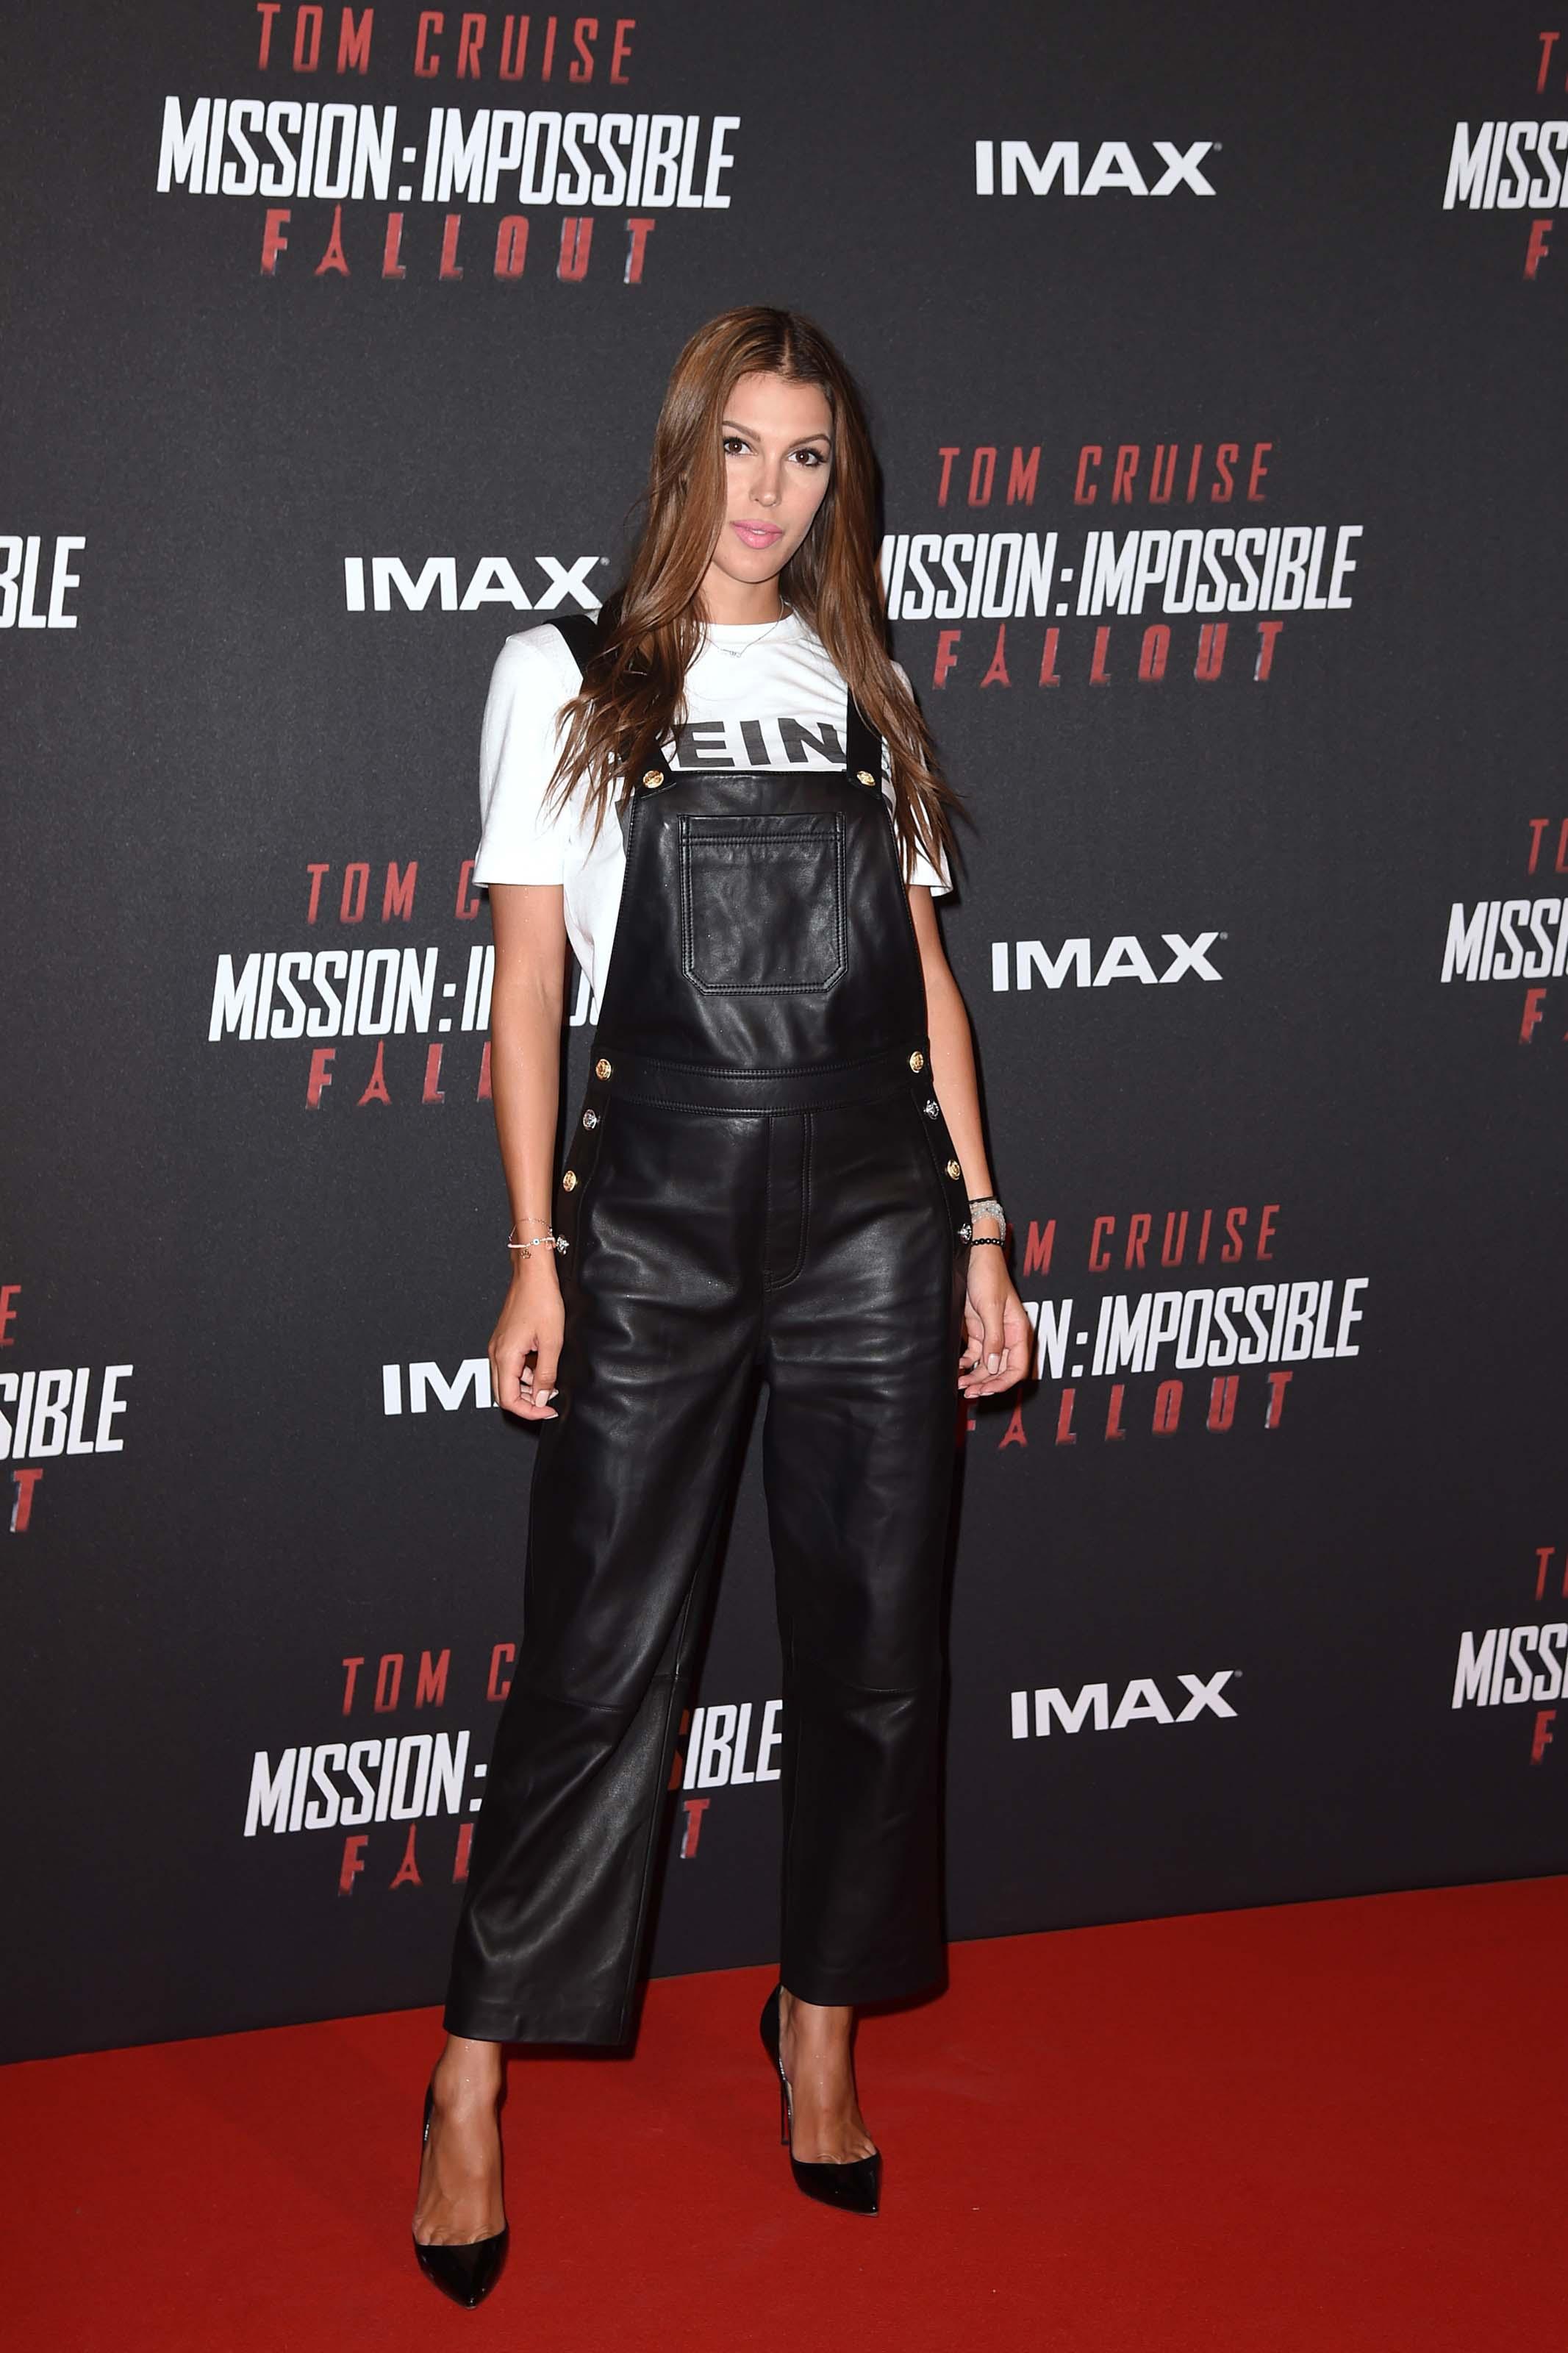 Iris Mittenaere attends Mission Impossible Fallout Premiere